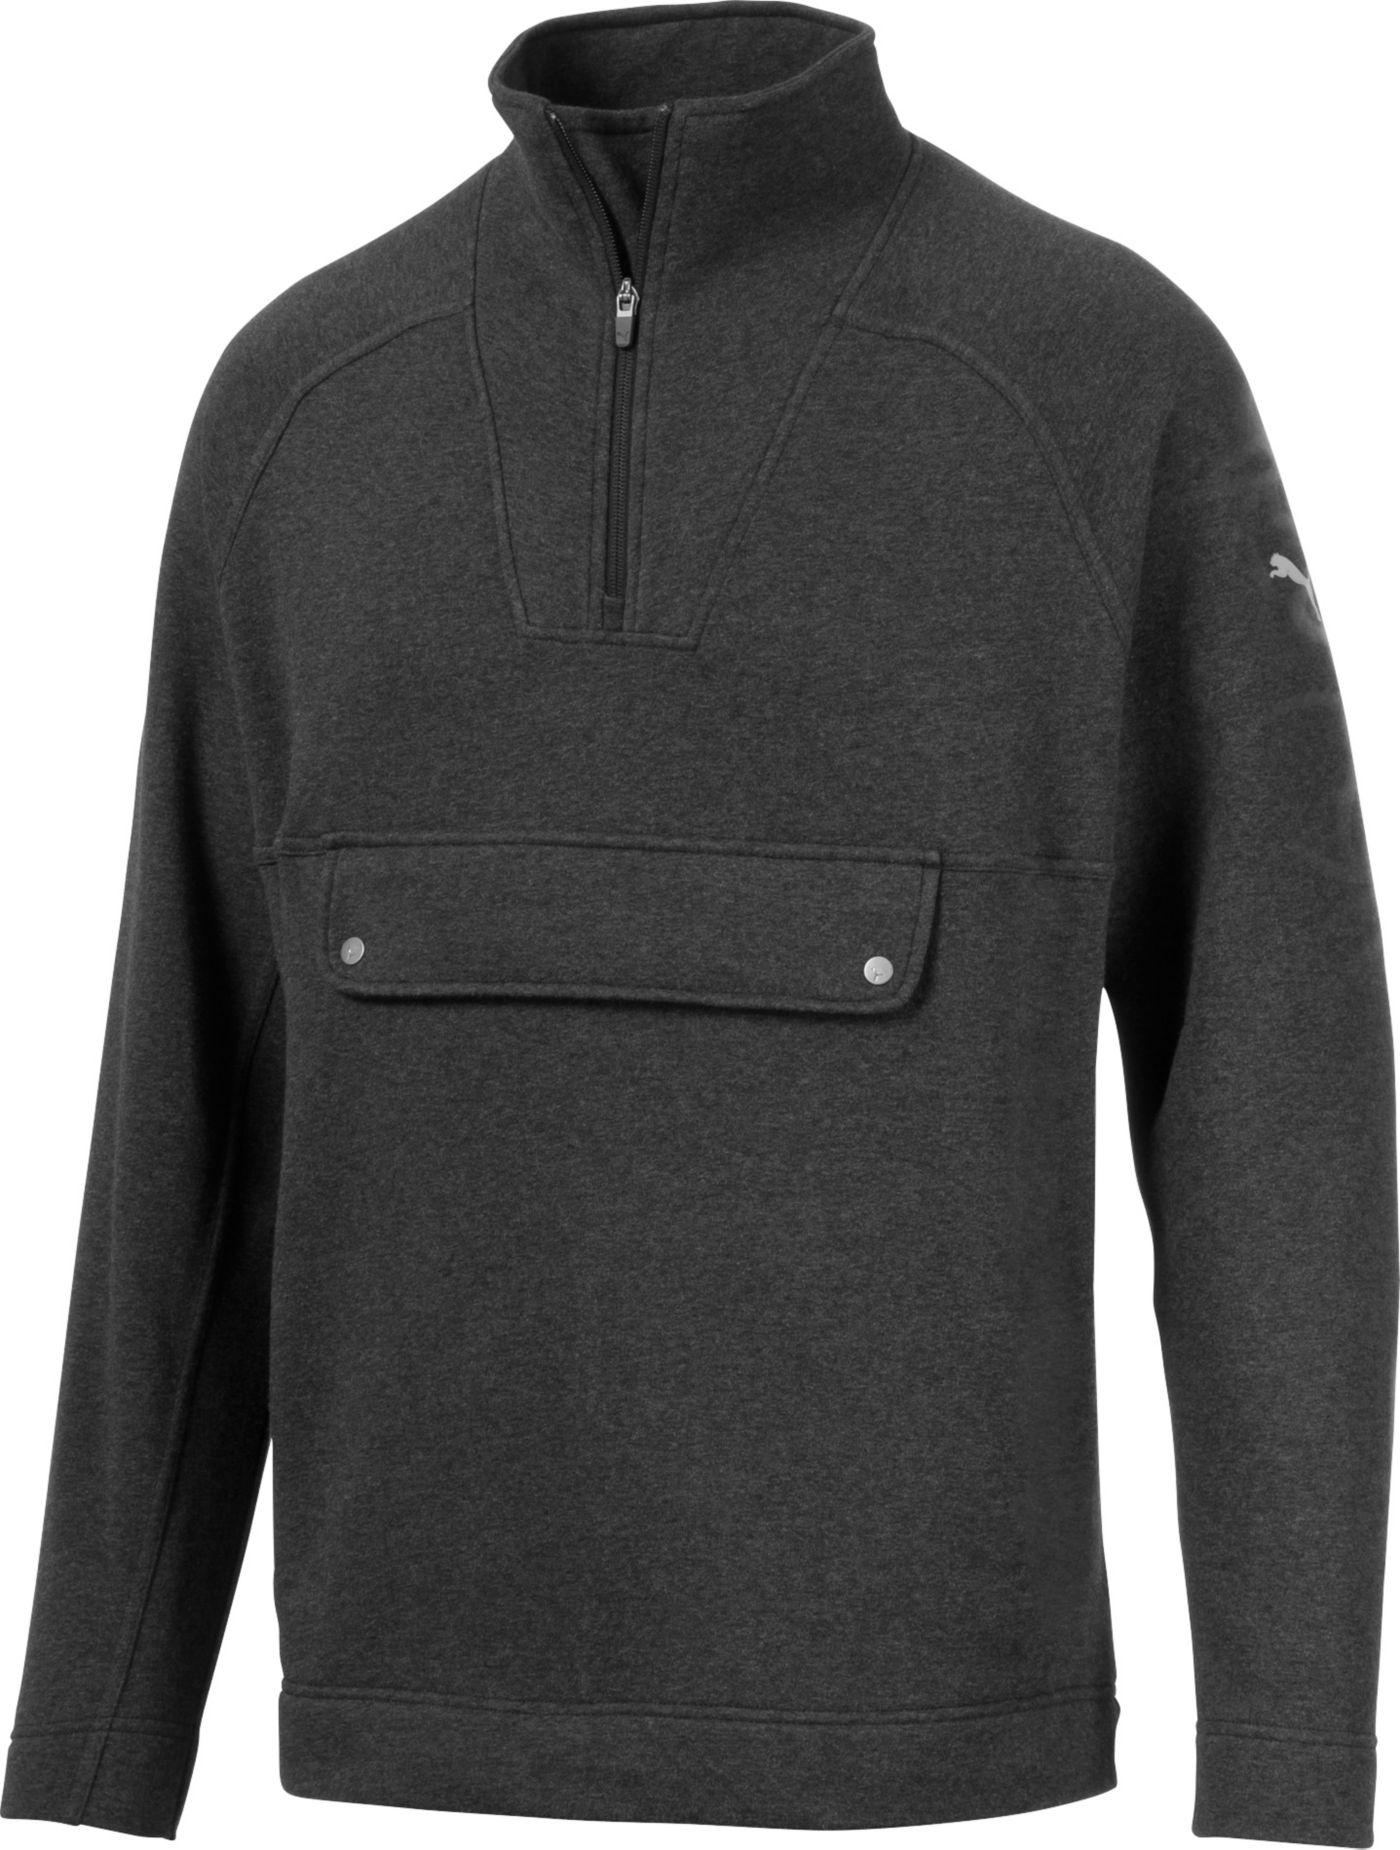 PUMA Men's Fusion ¼ Zip Golf Pullover